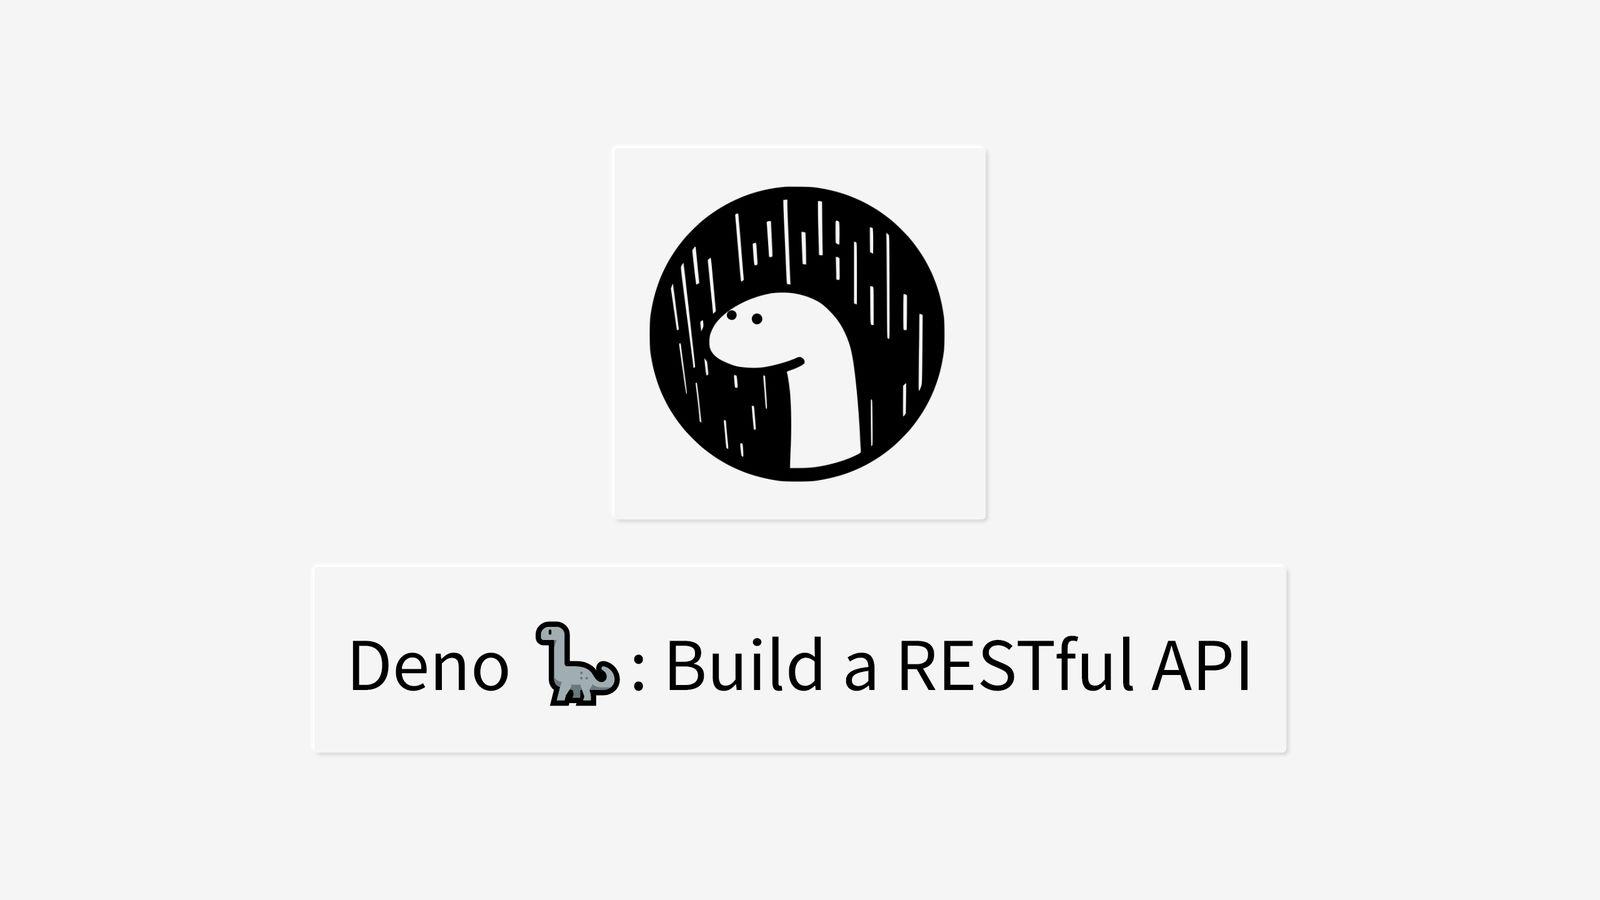 Build a RESTful API with Deno